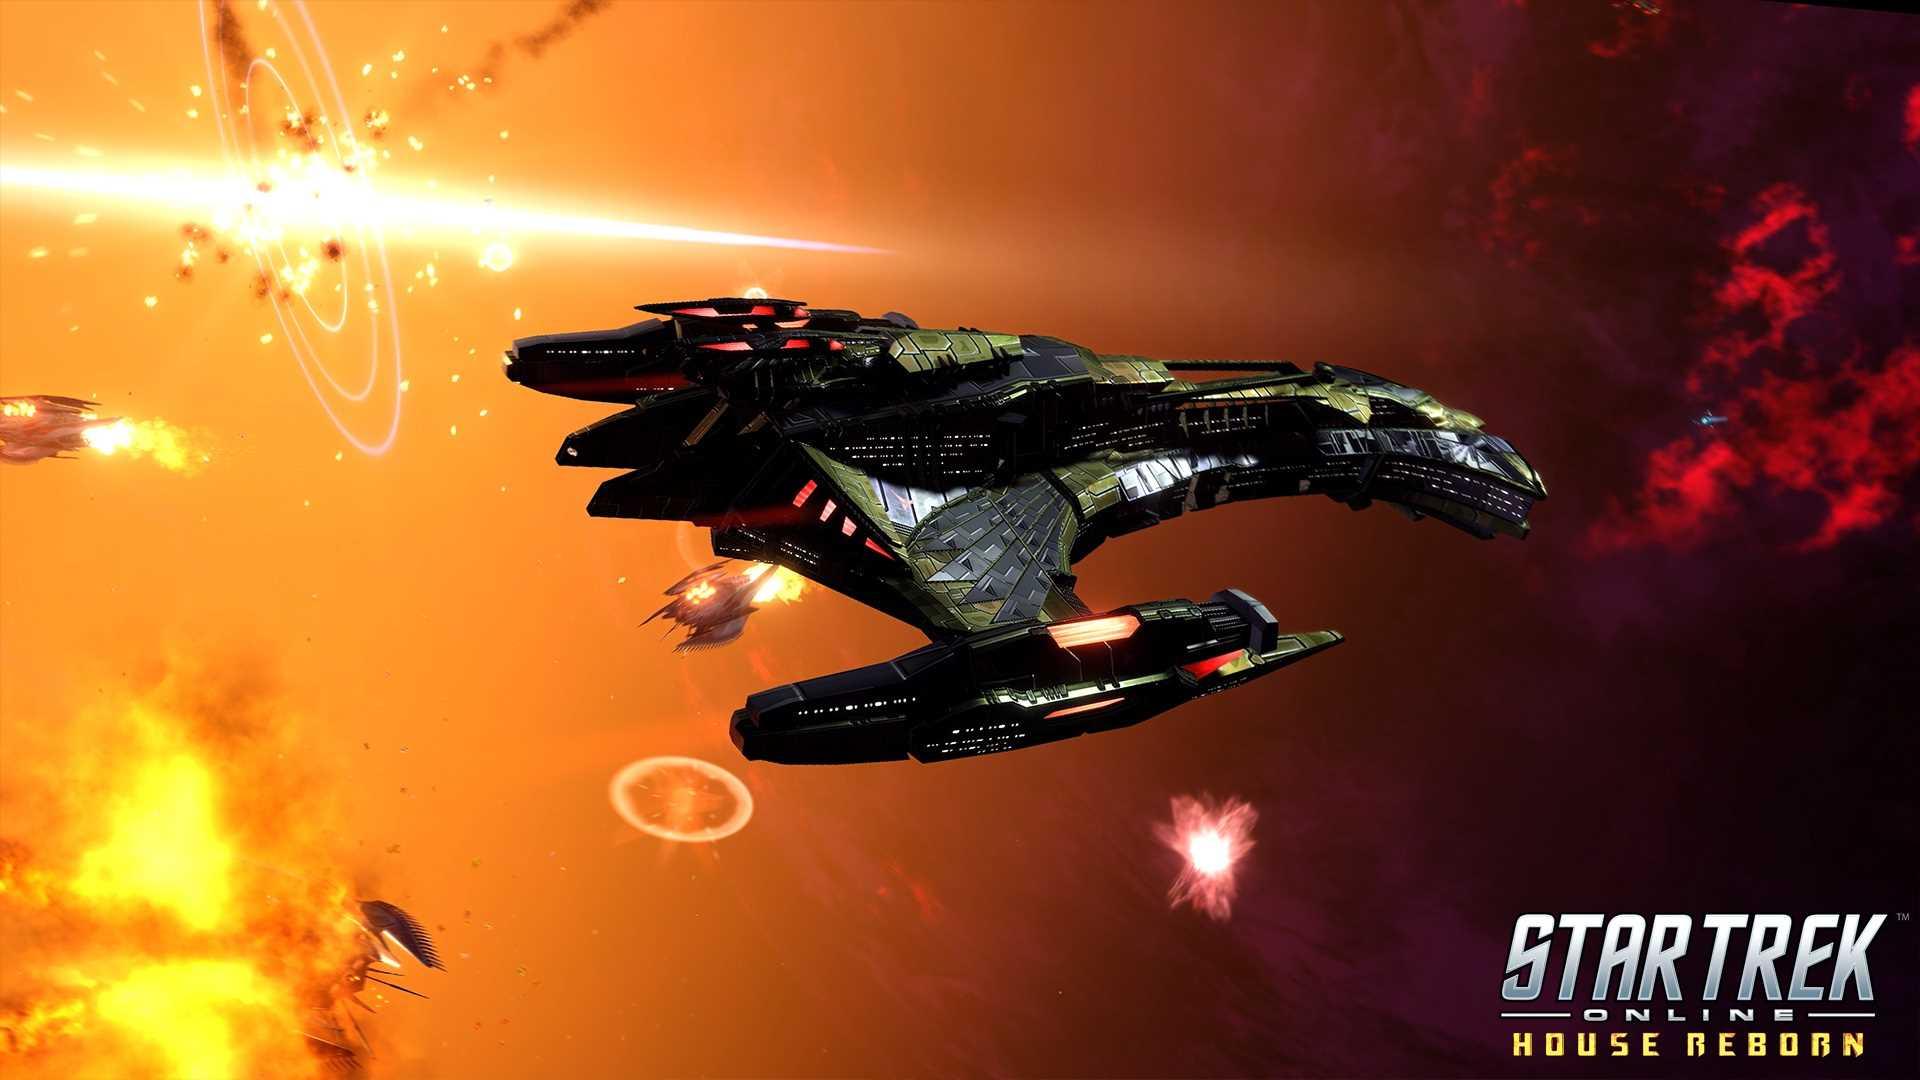 Star Trek Online House Reborn Screenshot 04